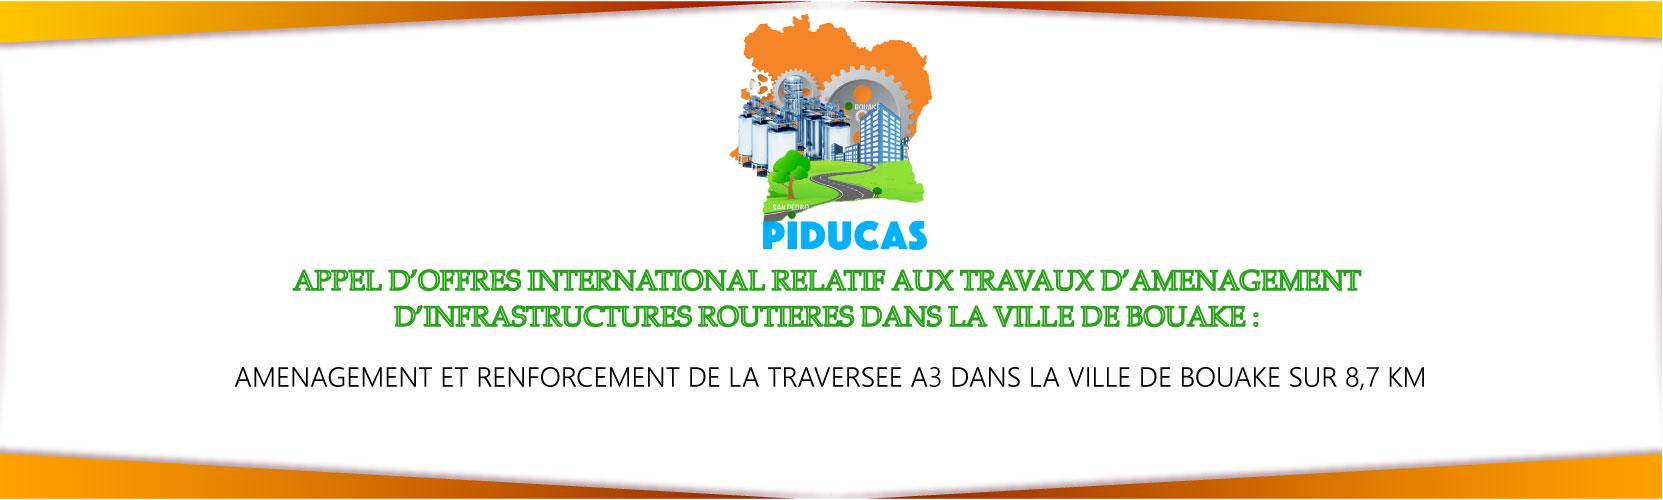 PIDUCAS-APPEL-OFFRES-INTERNATIONAL-BOUAKE-2